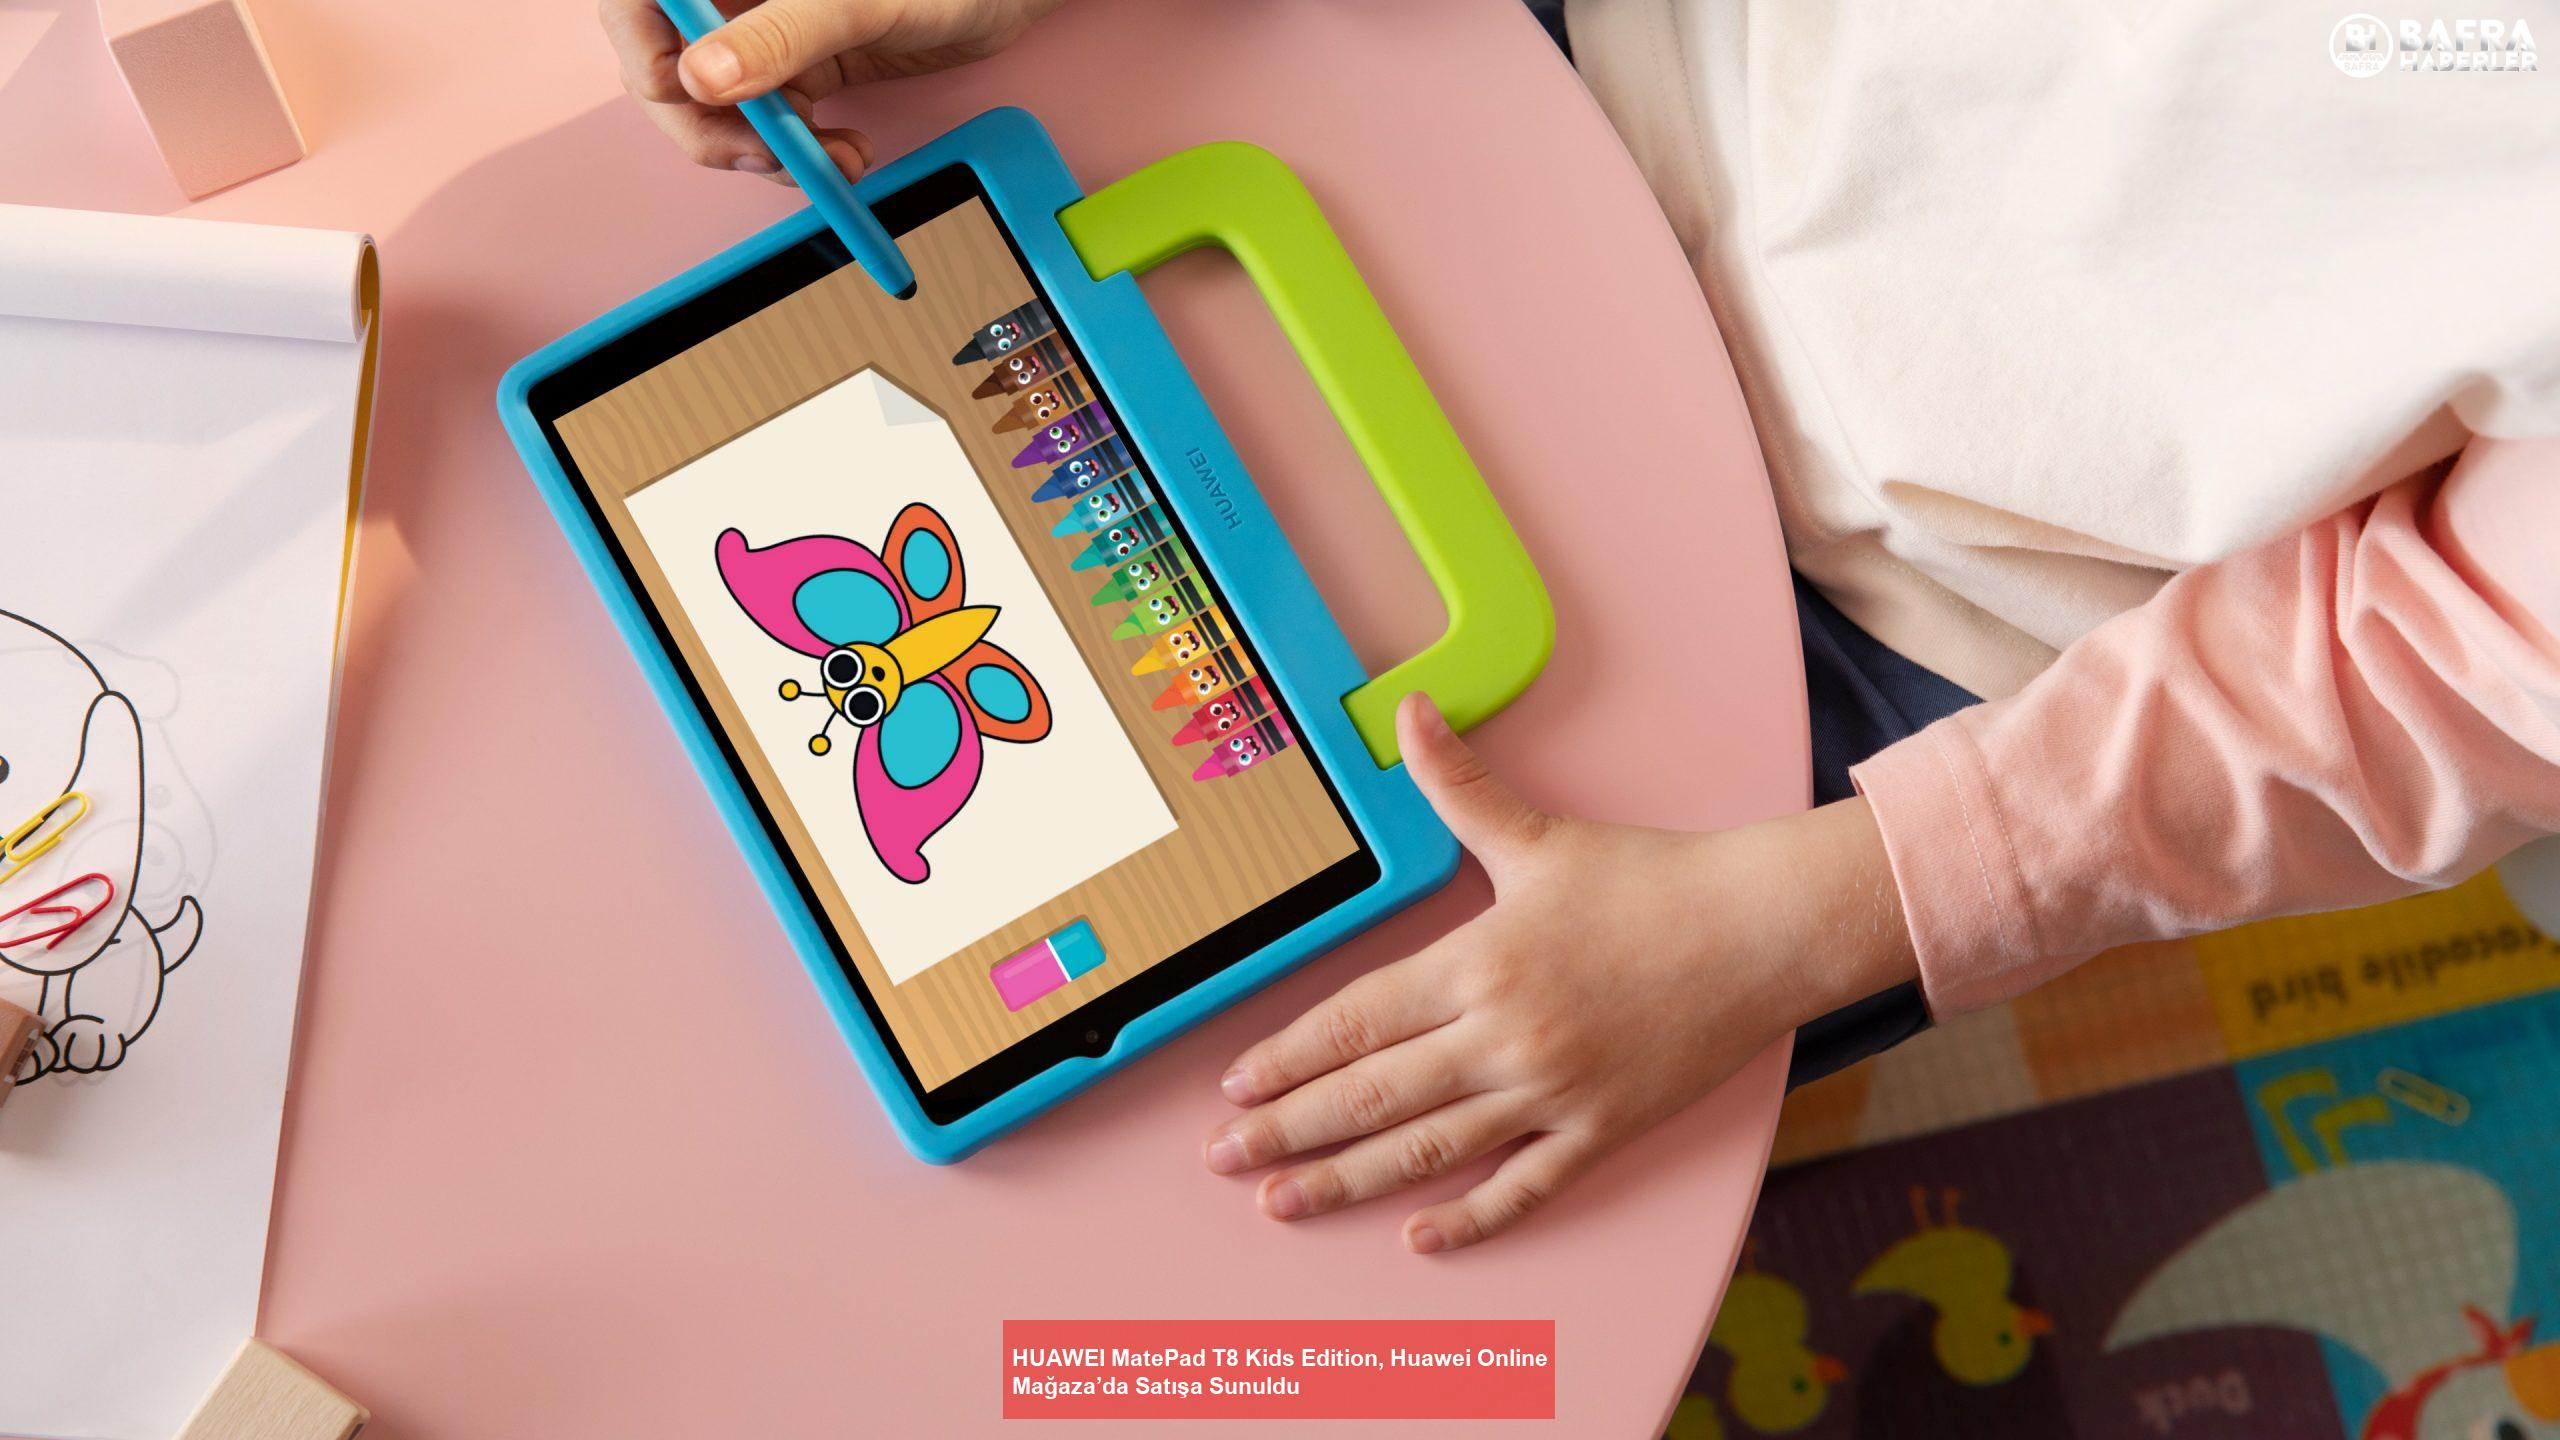 huawei matepad t8 kids edition, huawei online mağaza'da satışa sunuldu 4